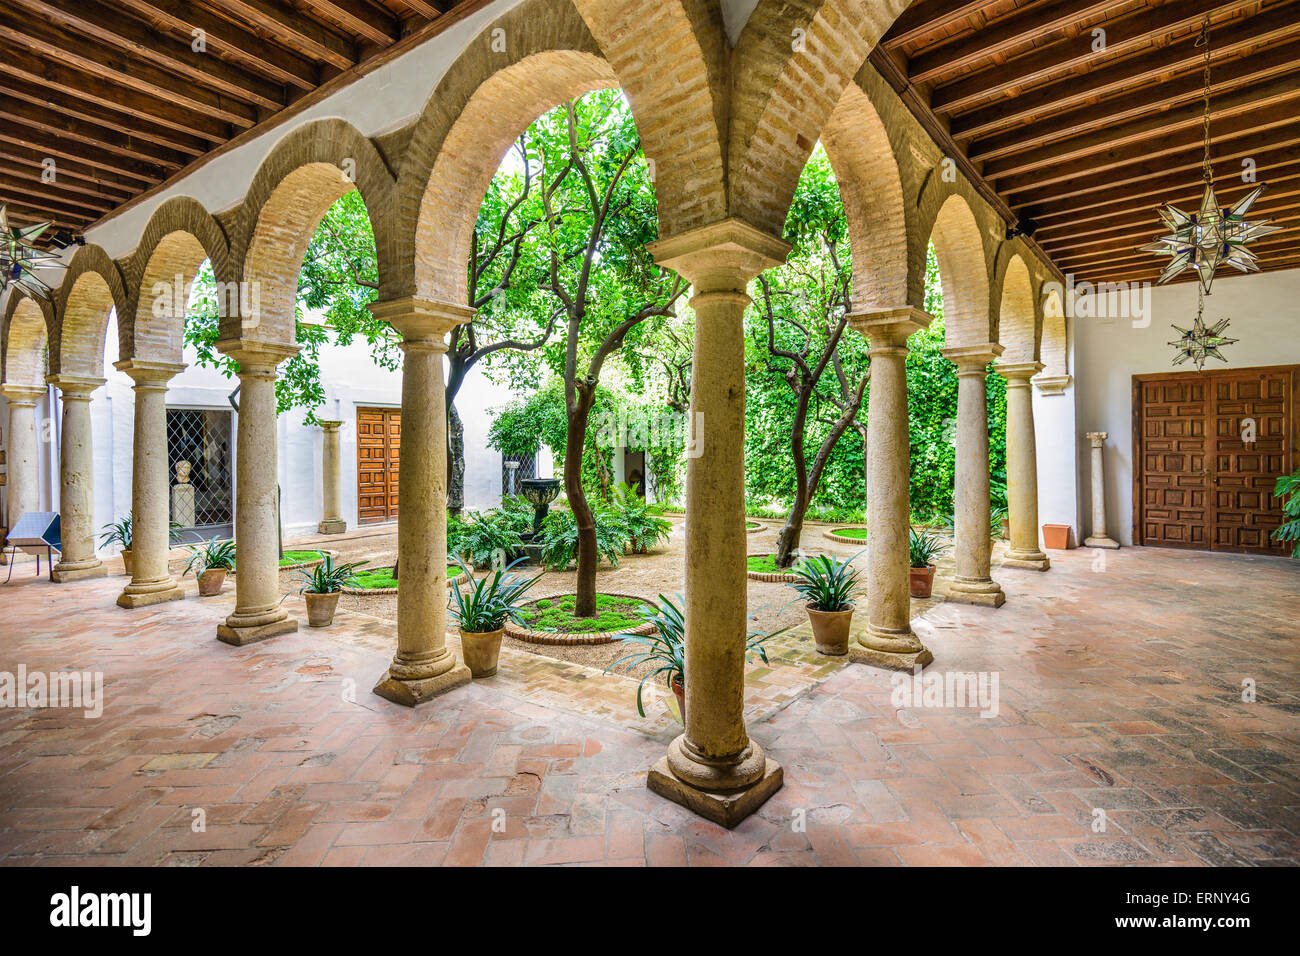 Viana Palace at the courtyard gardens in Cordoba, Spain. Stock Photo